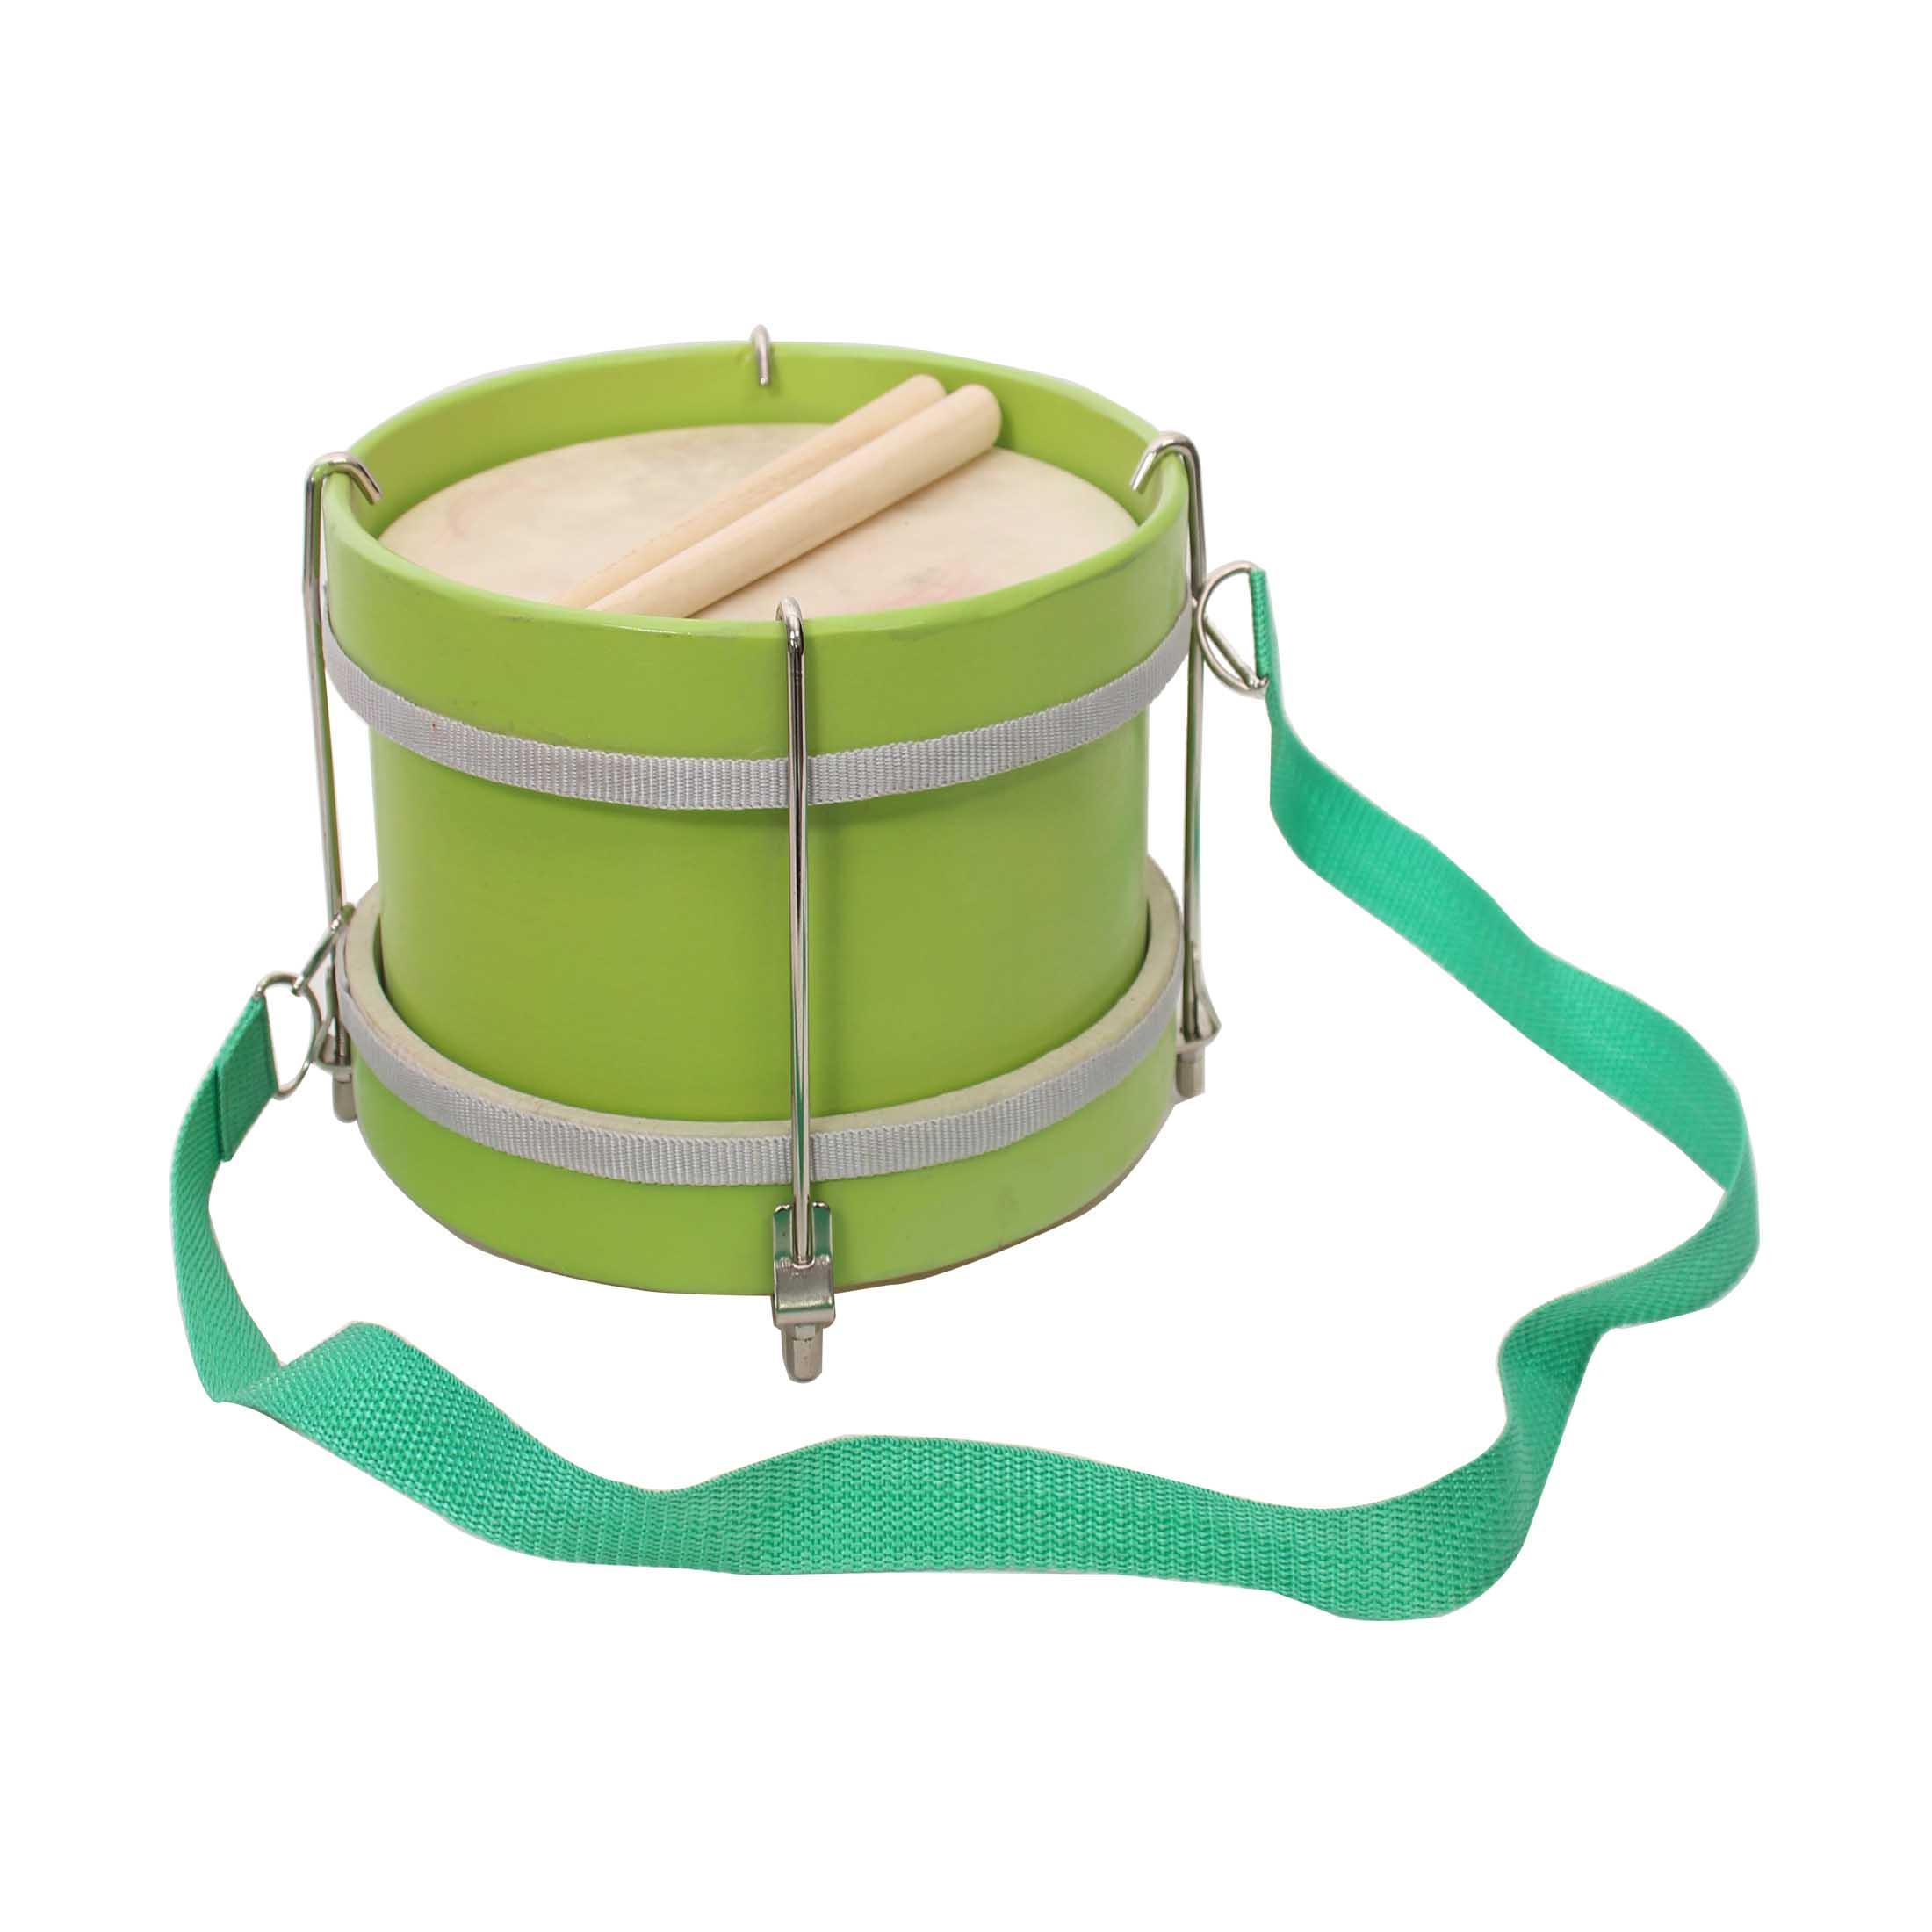 Drum Head Goat Skin, Drum Head Goat Skin Suppliers and.